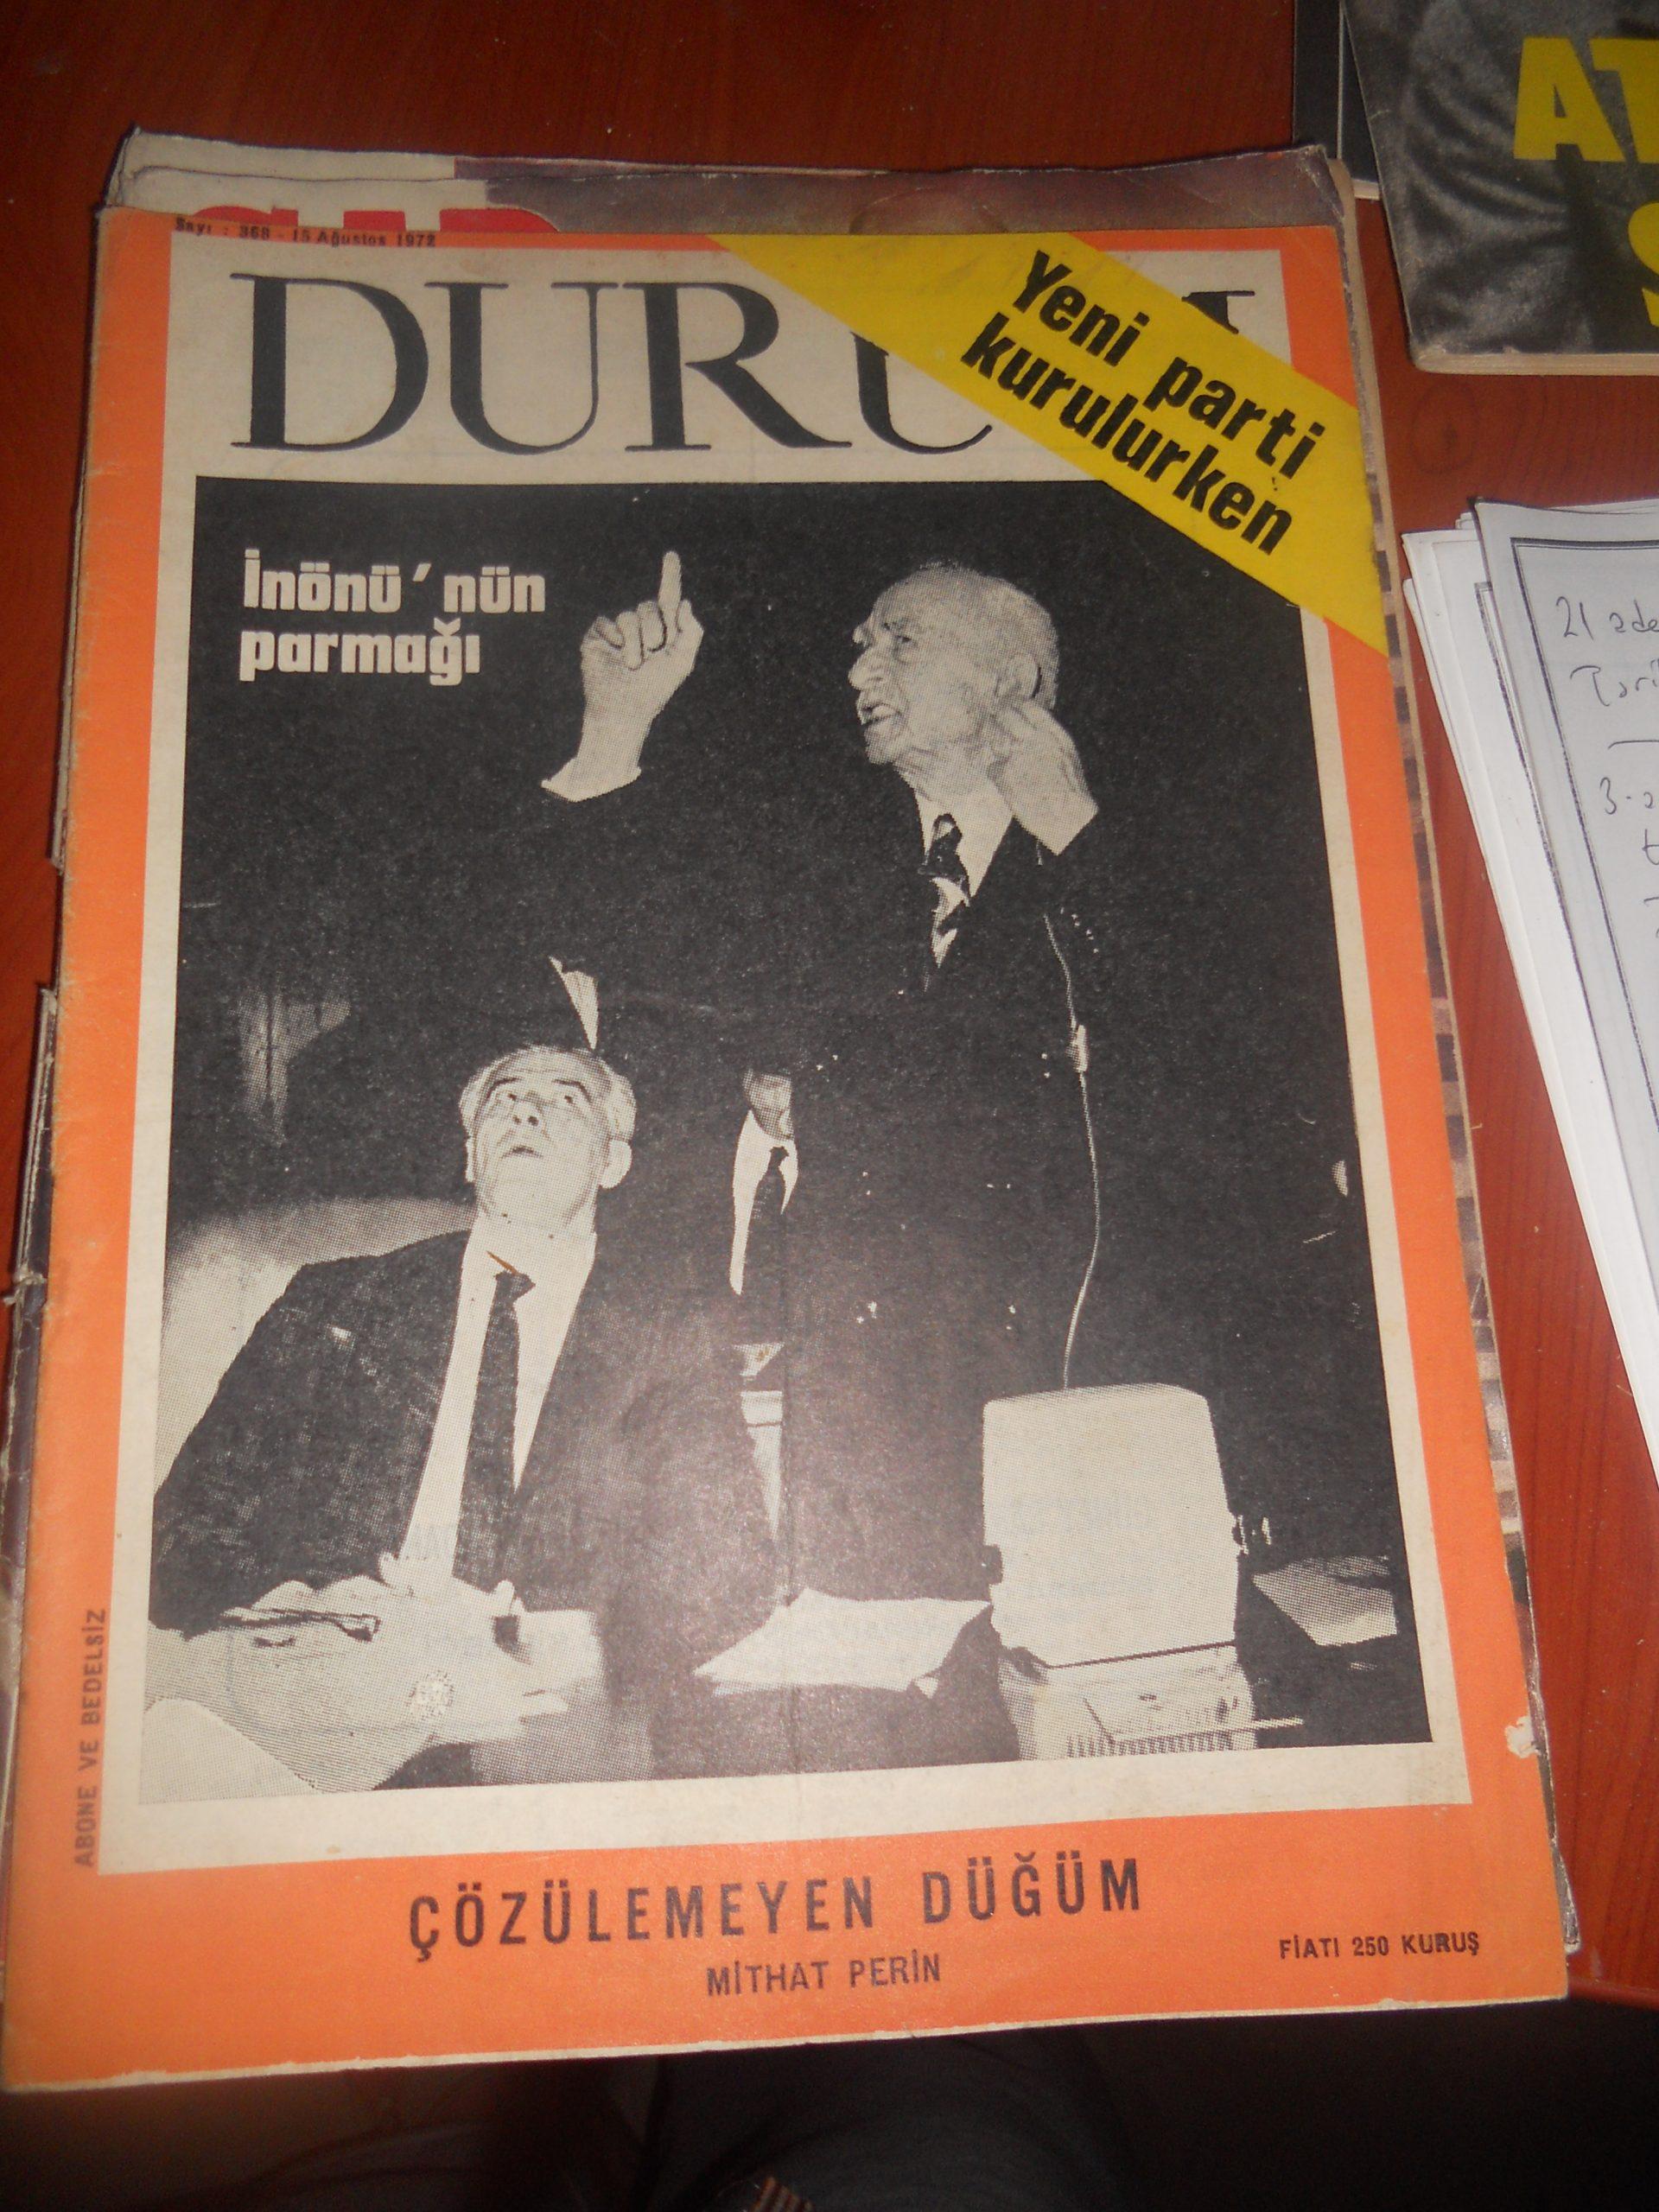 DURUM dergisi/6 adet/1973 yılına ait/ toplam30 tl